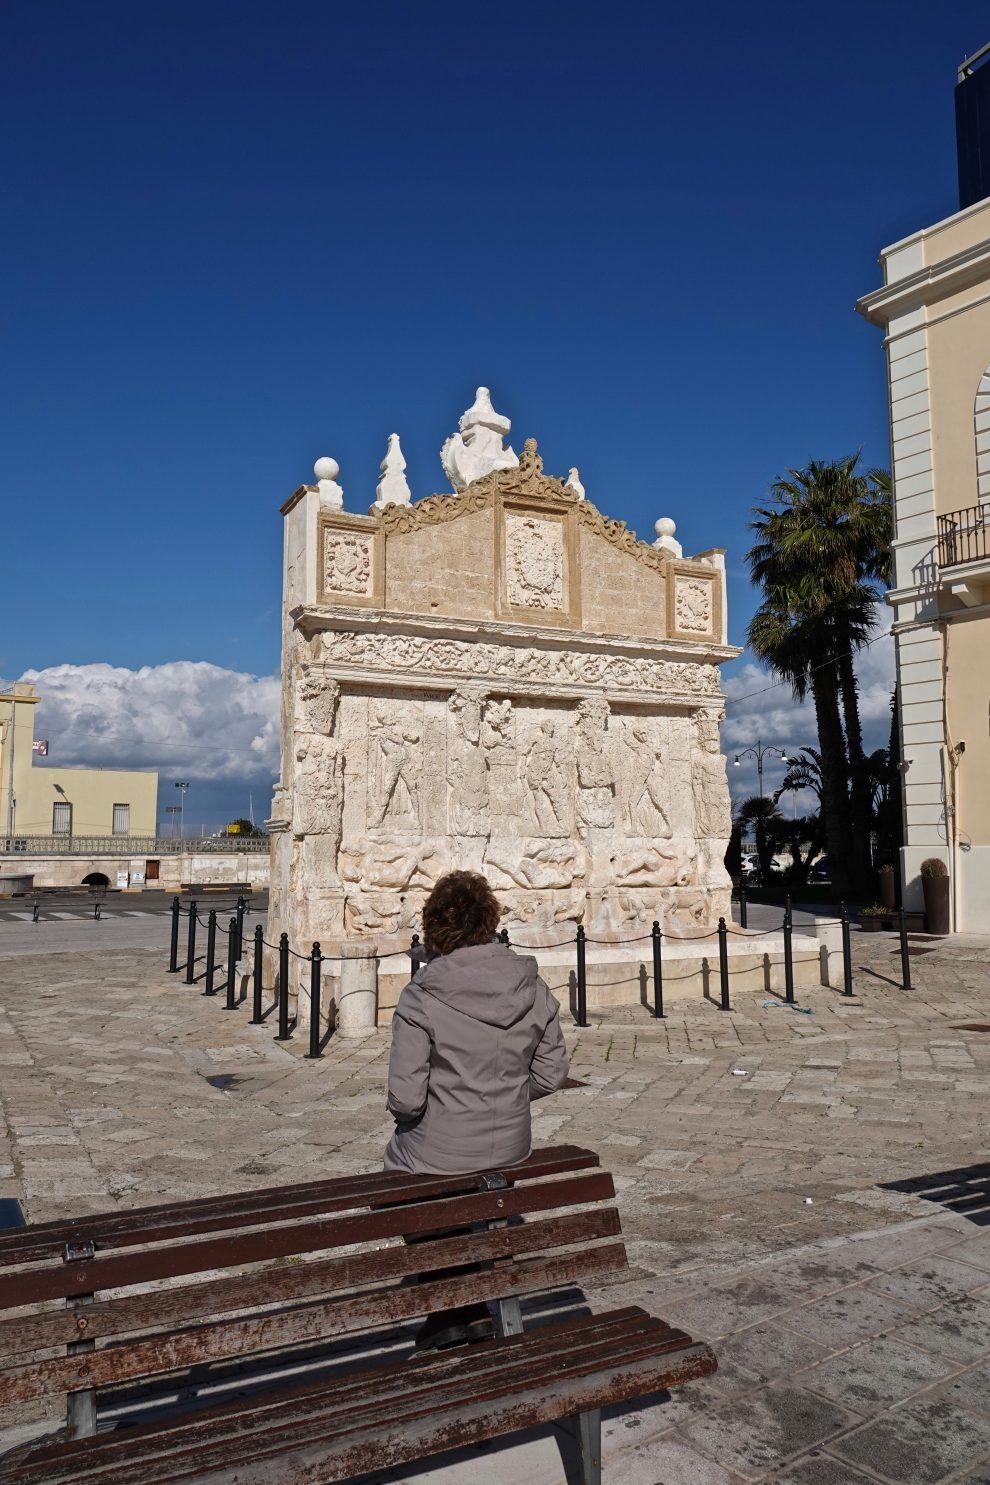 La fontana greca.